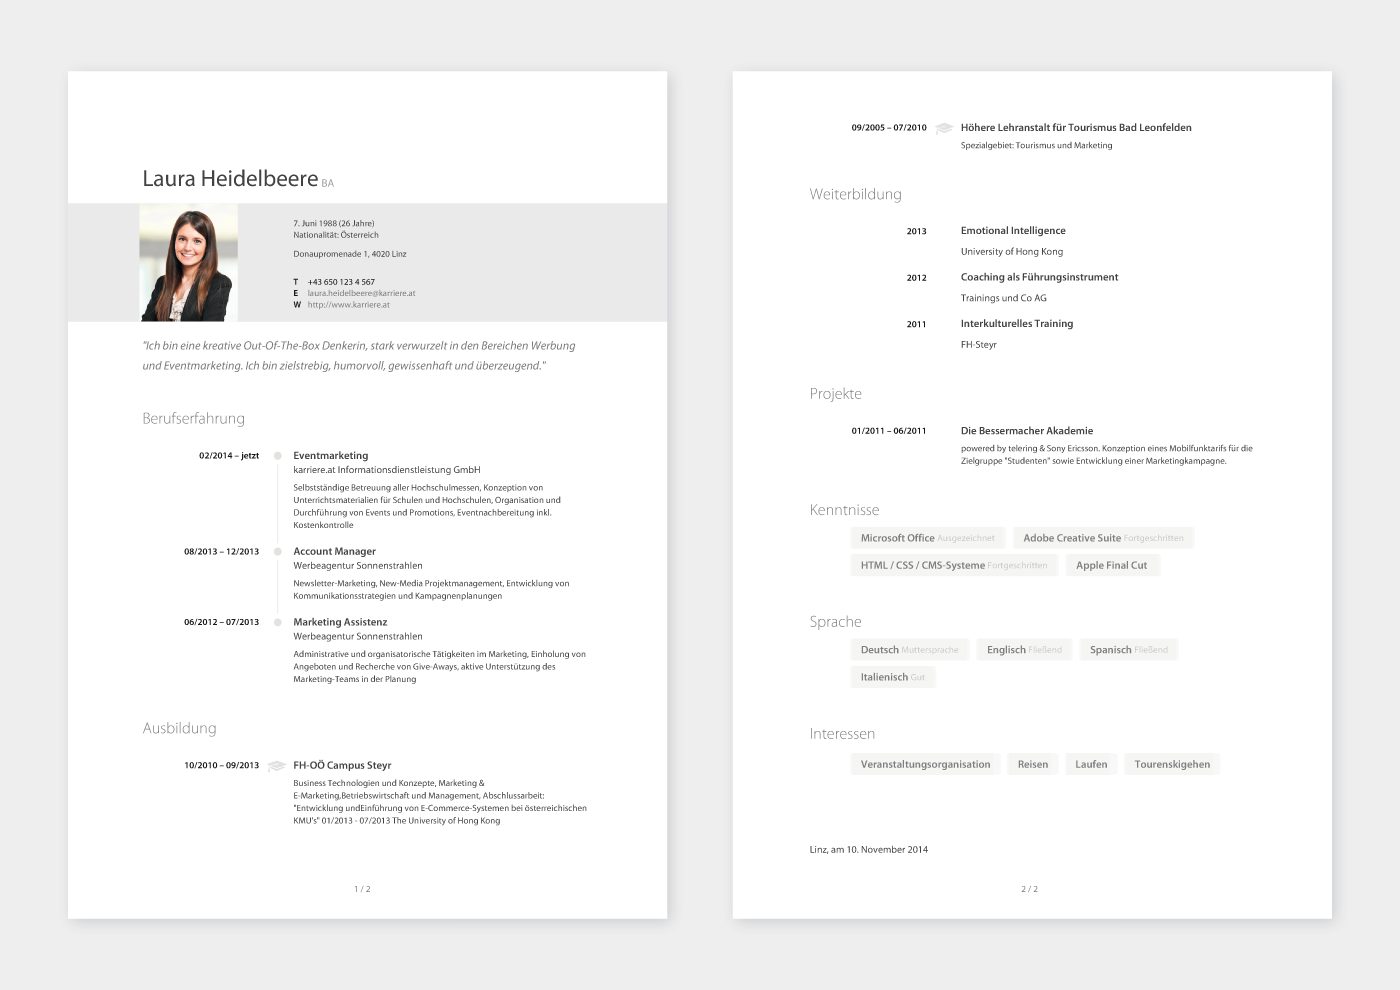 Charmant Lebenslauf Karriere Beispiele Galerie - Entry Level Resume ...